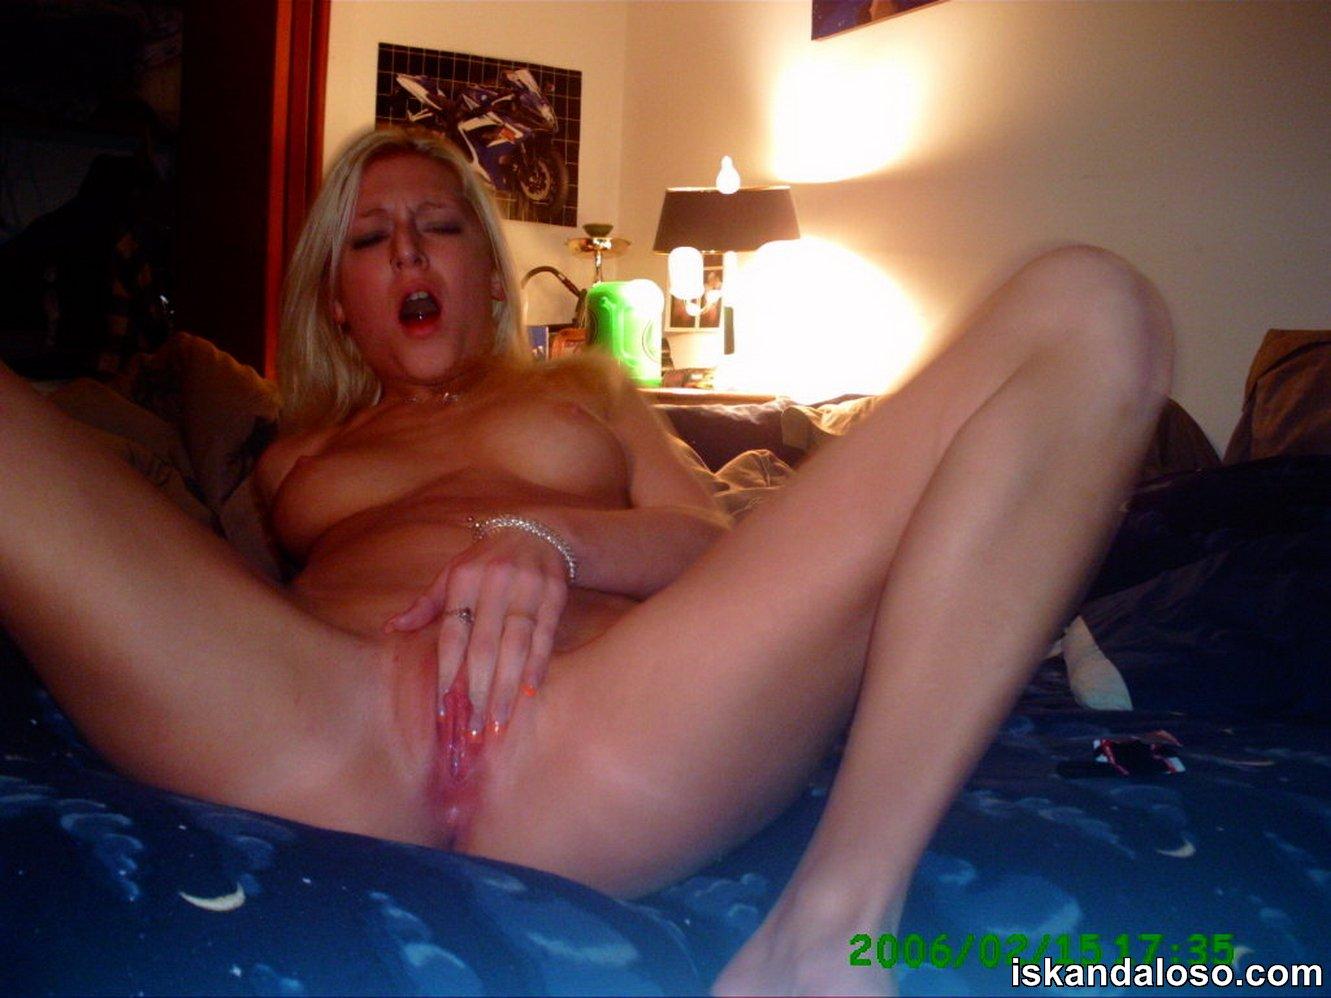 blondinka-masturbiruet-na-kameru